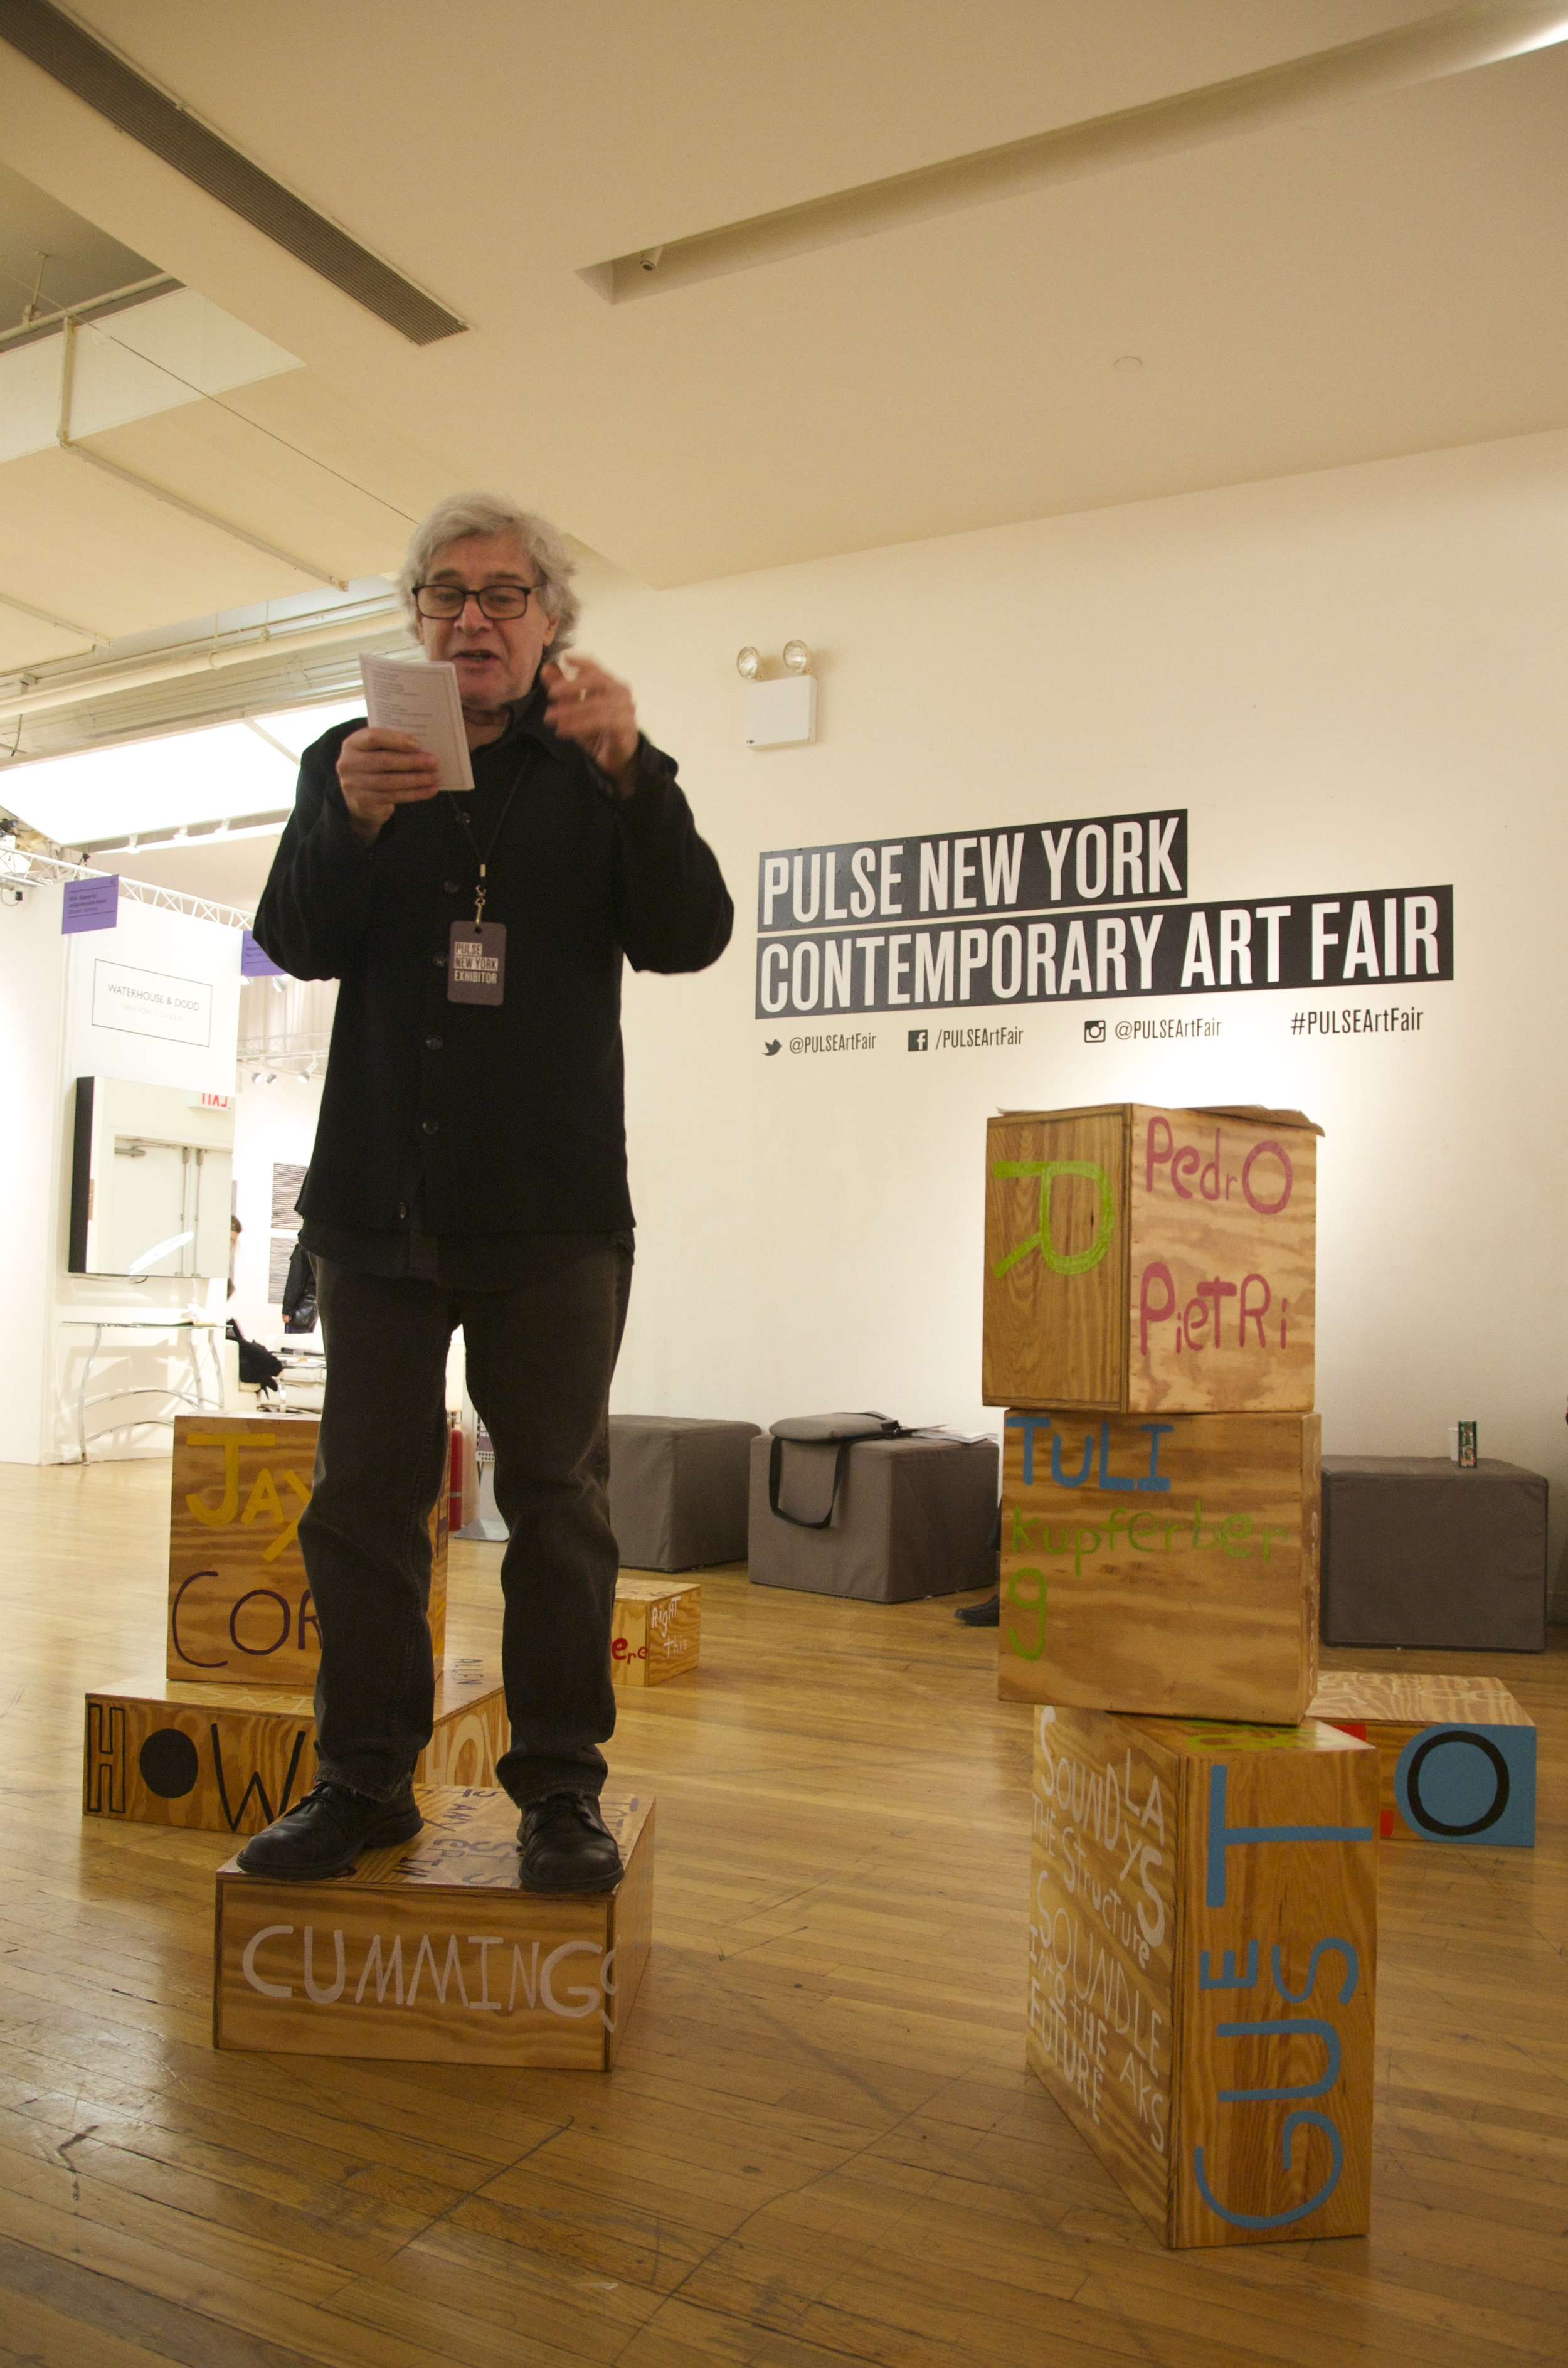 Poet Sculpture PULSE Art Fair, Steve Dalachinsky, New York, NY 2014.jpg